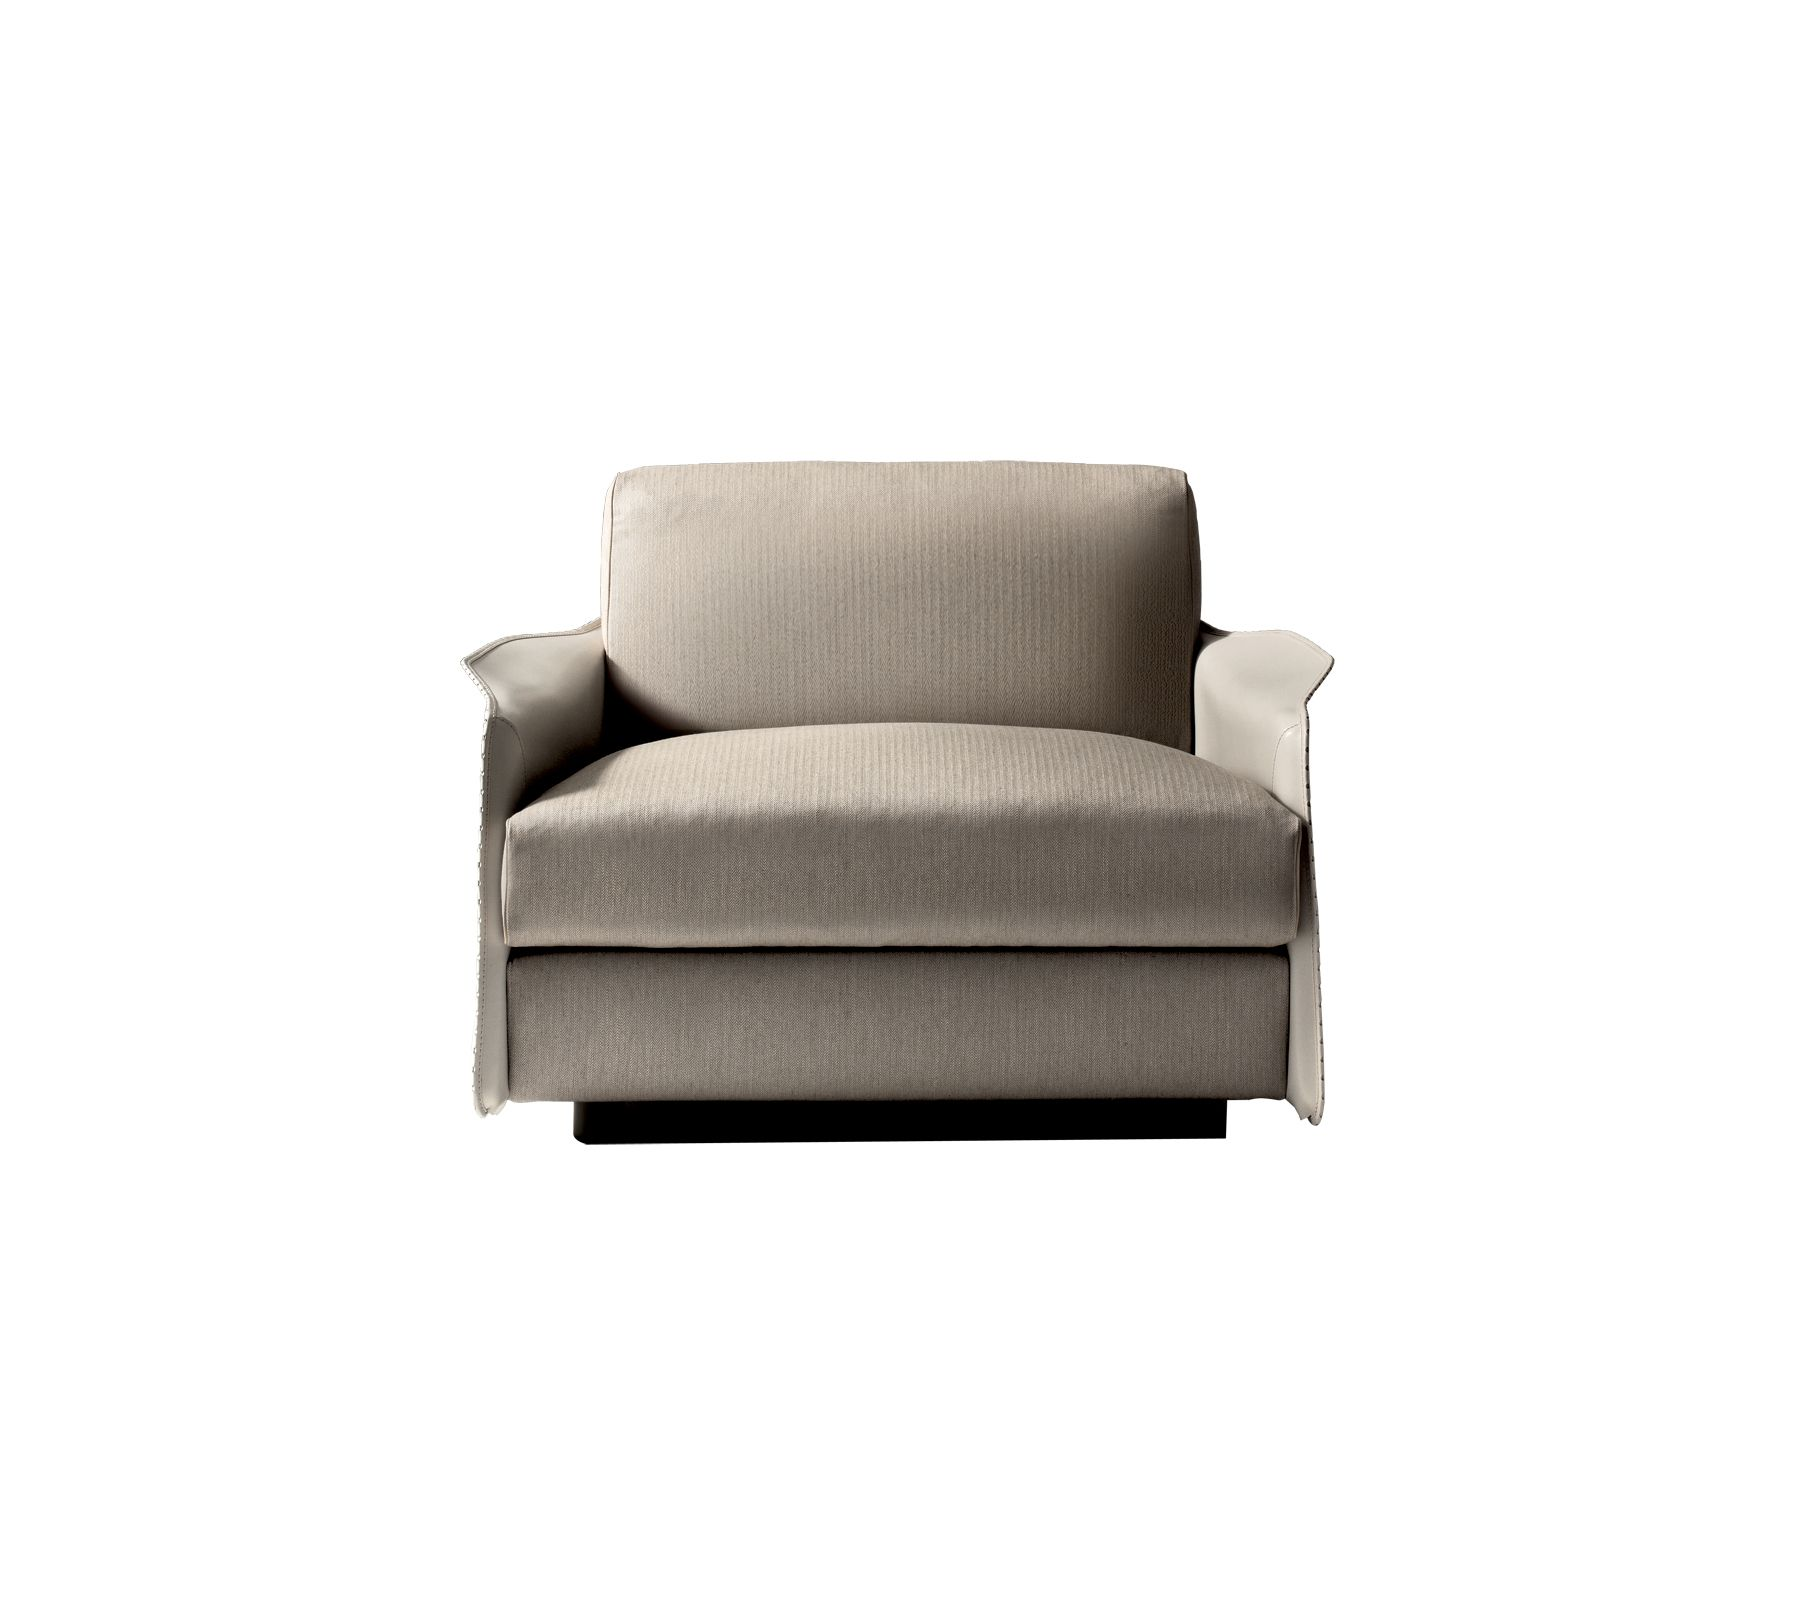 Fabula Armchair by Giorgetti on ECC | Armchair, Sofa